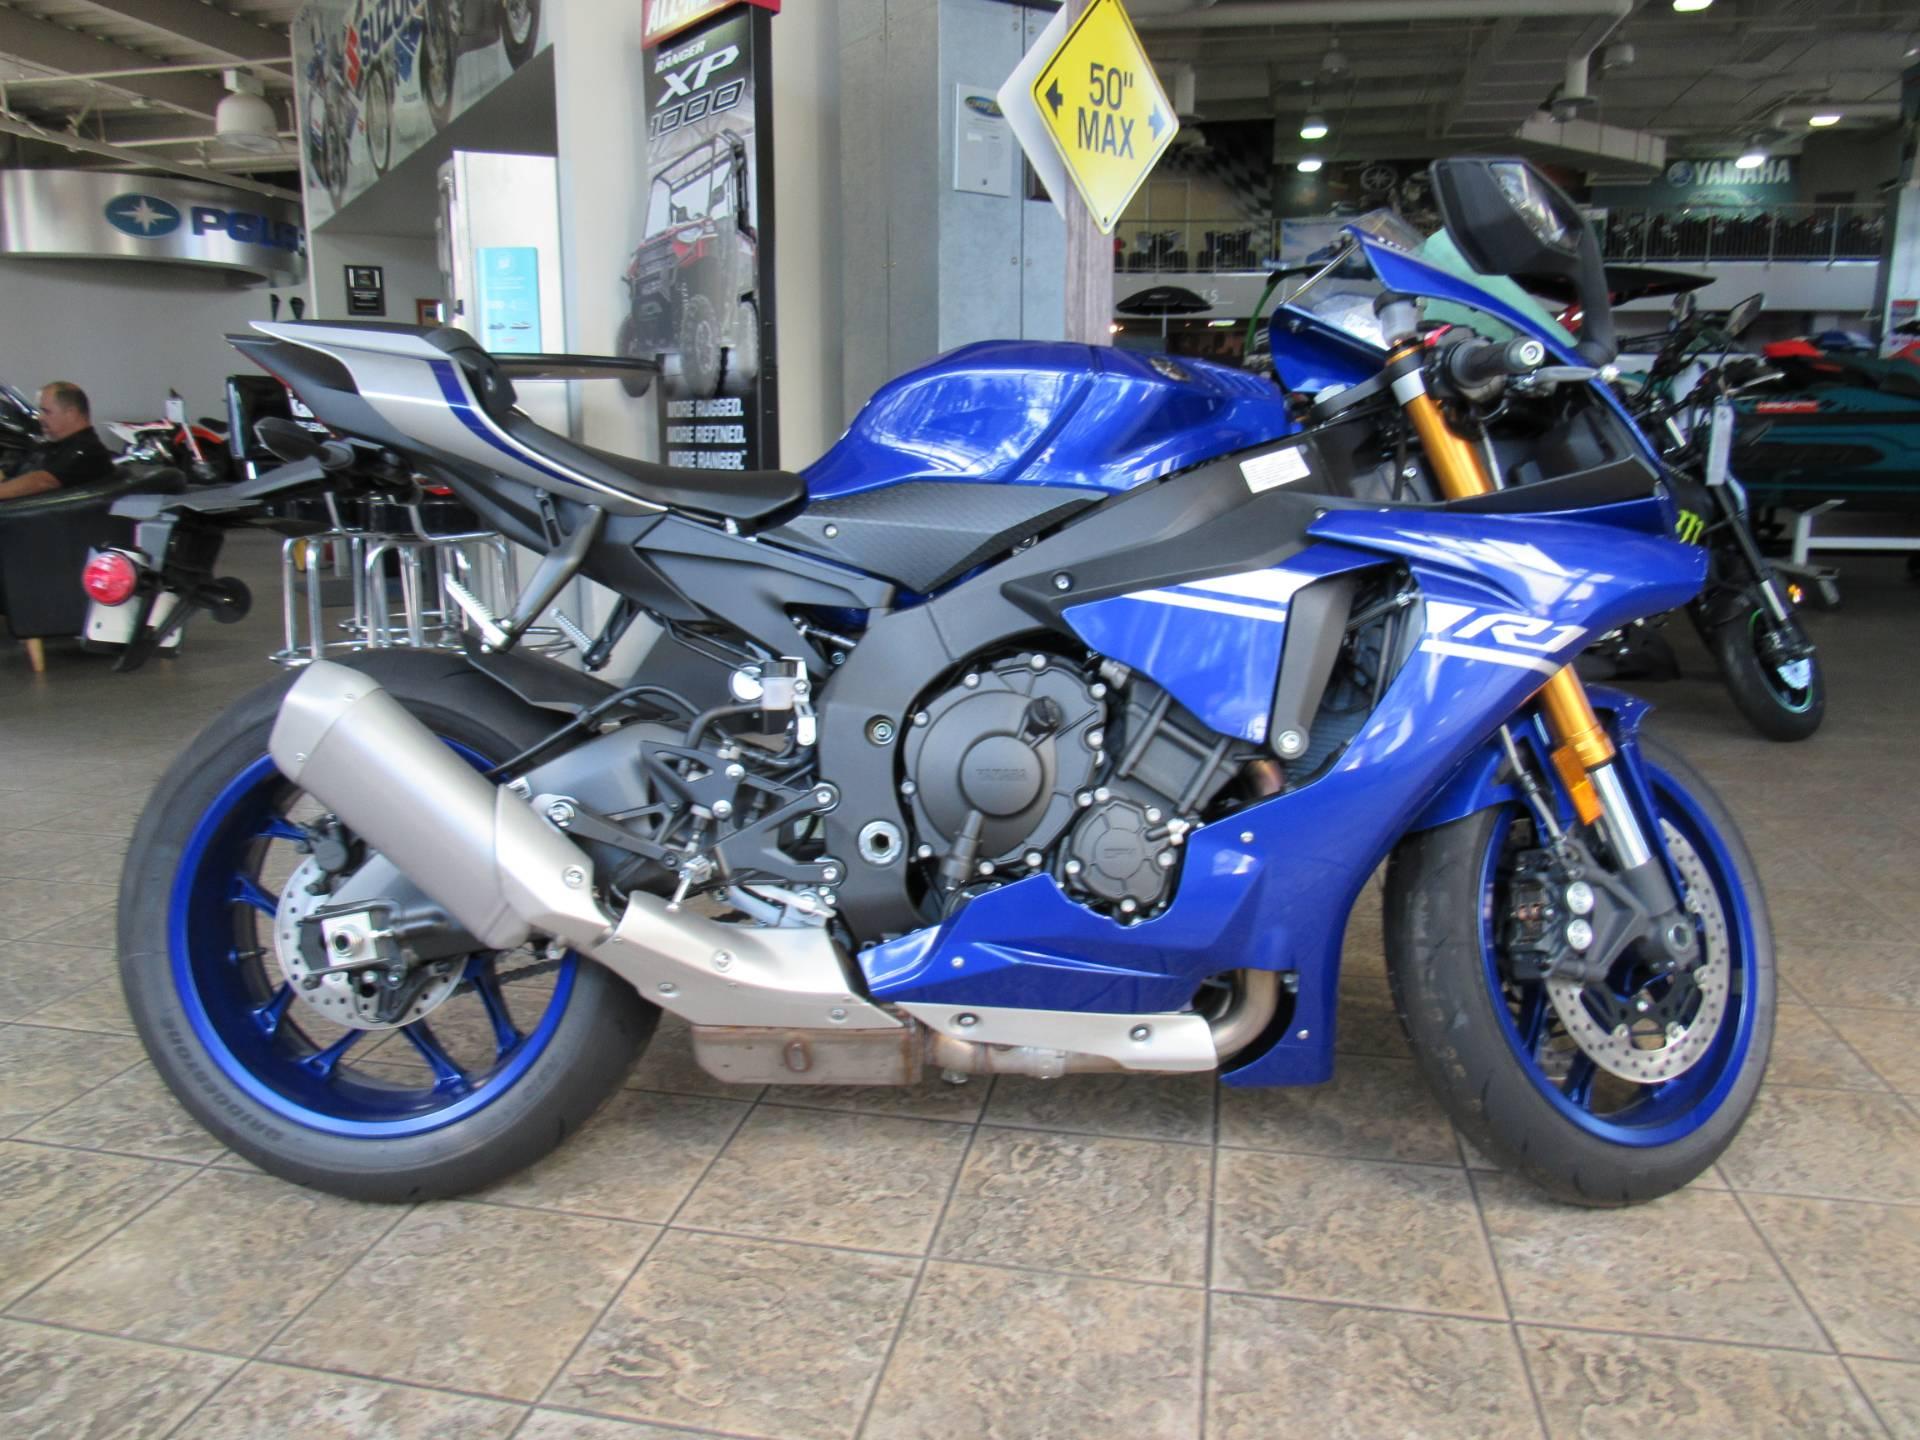 2017 Yamaha YZF-R1 for sale 142697